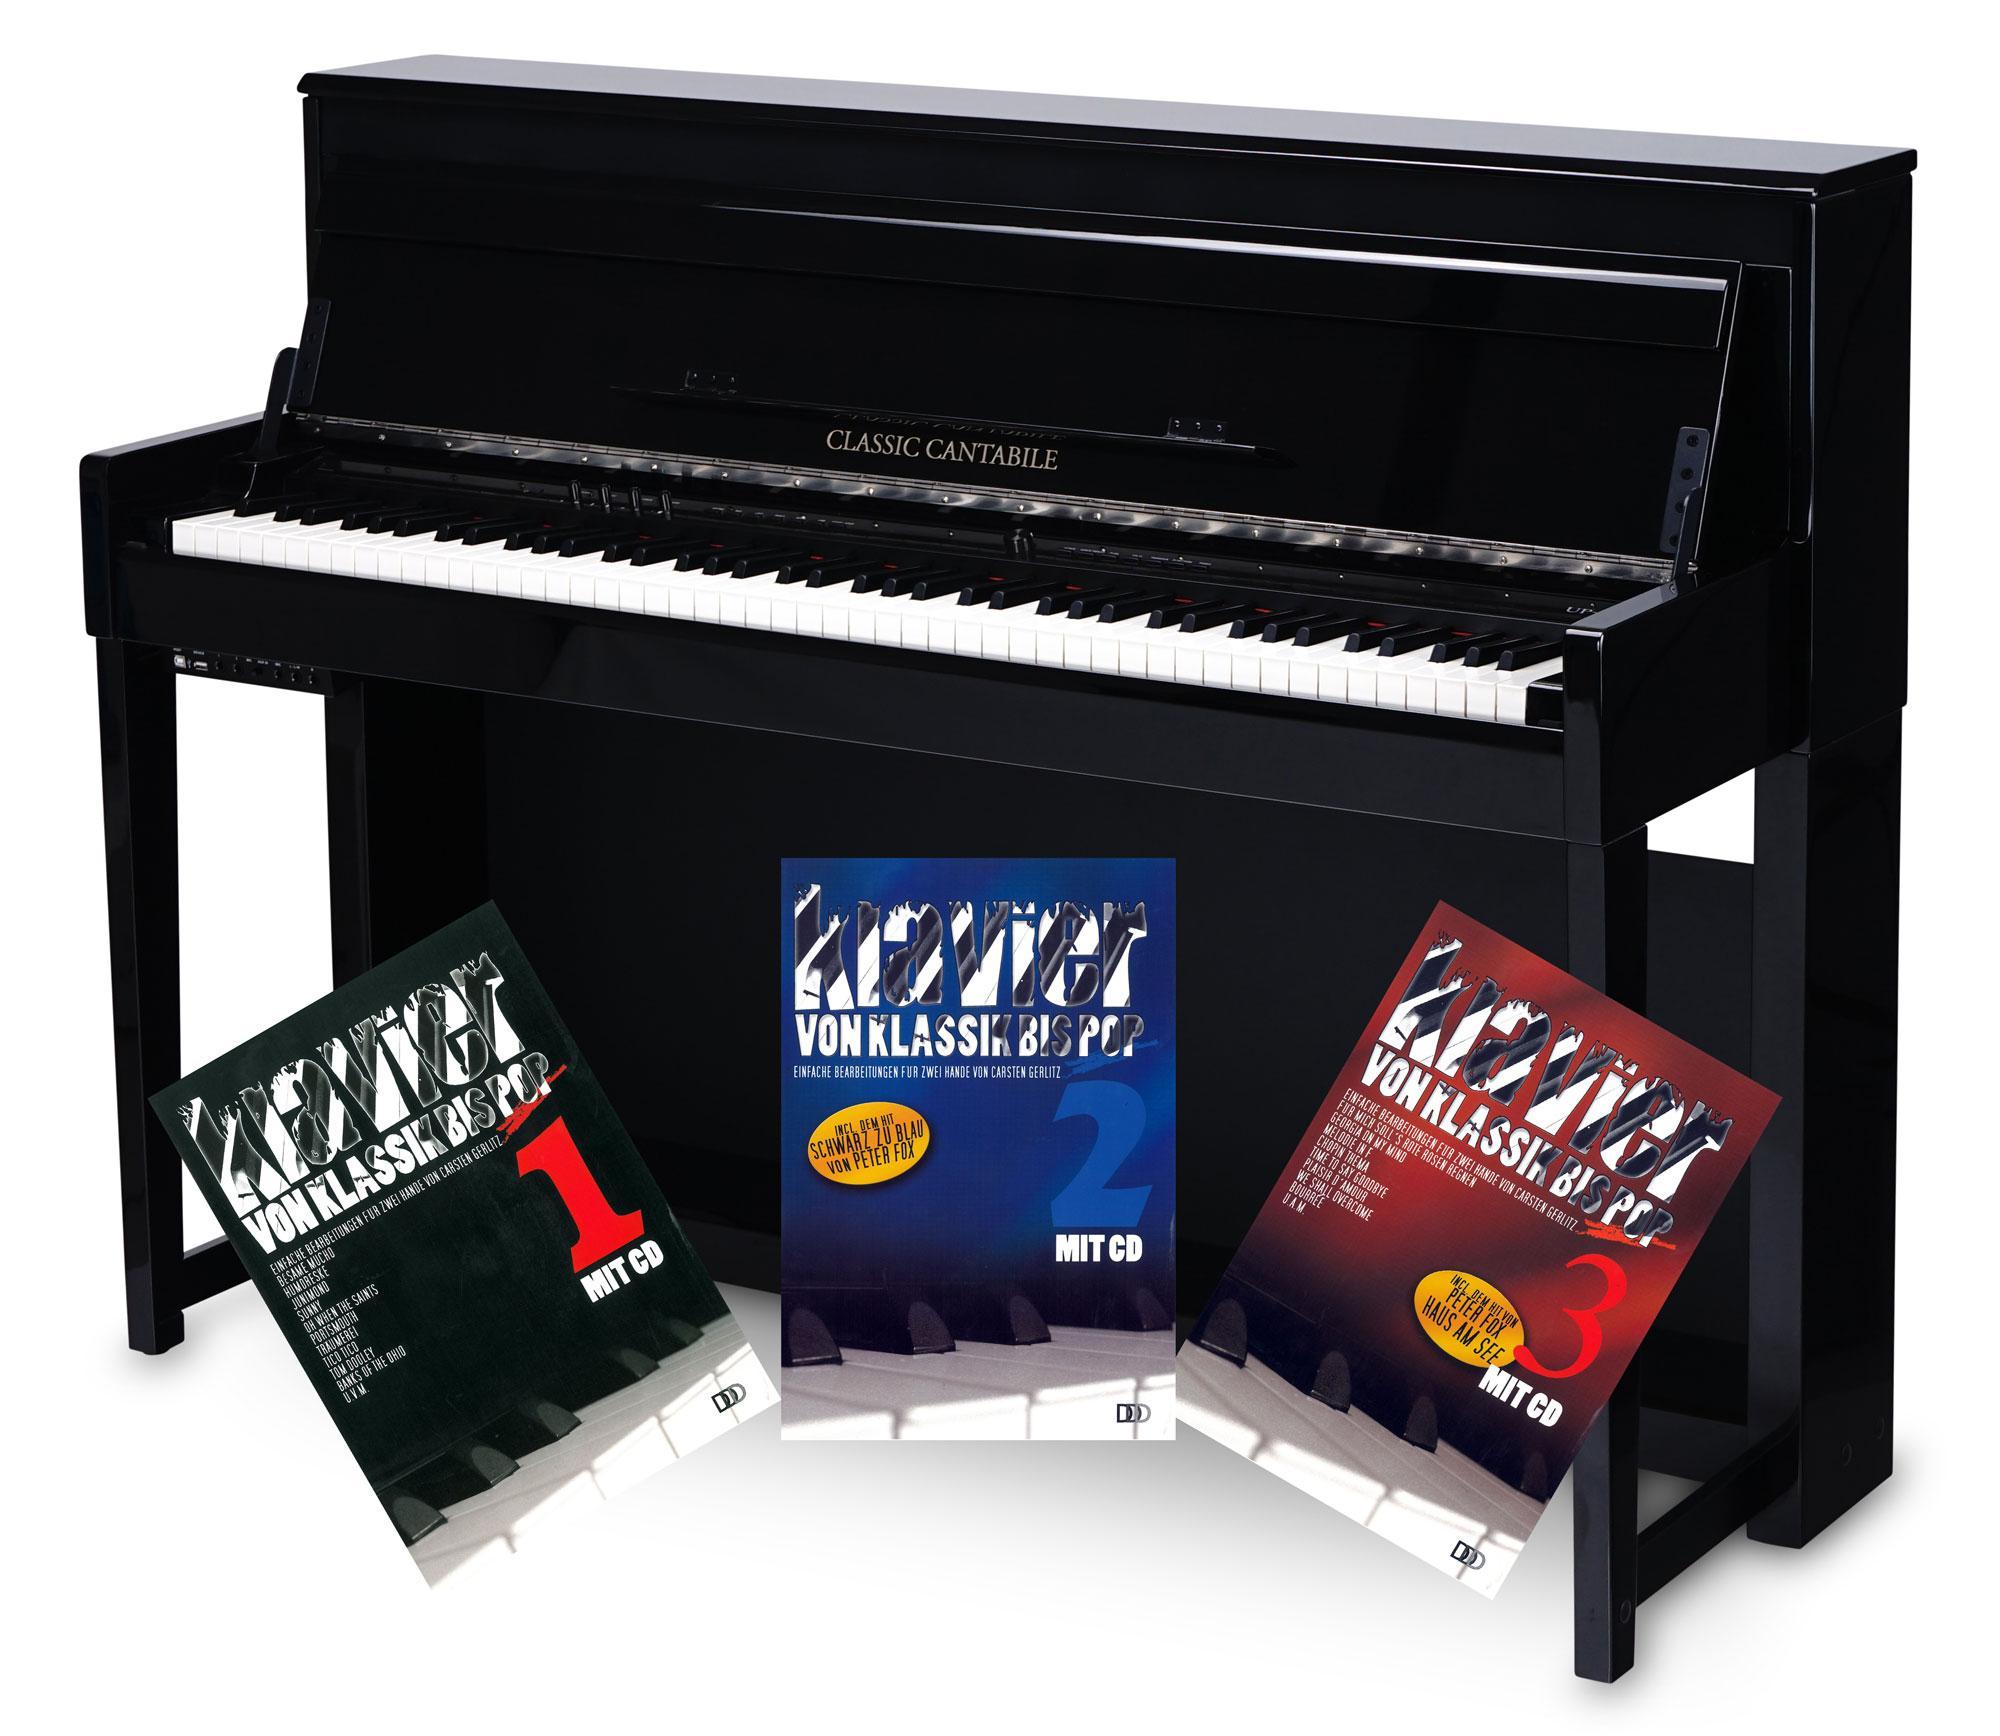 Classic Cantabile UP 1 SH Upright E Piano Schwarz hochglanz Klavierschule Set